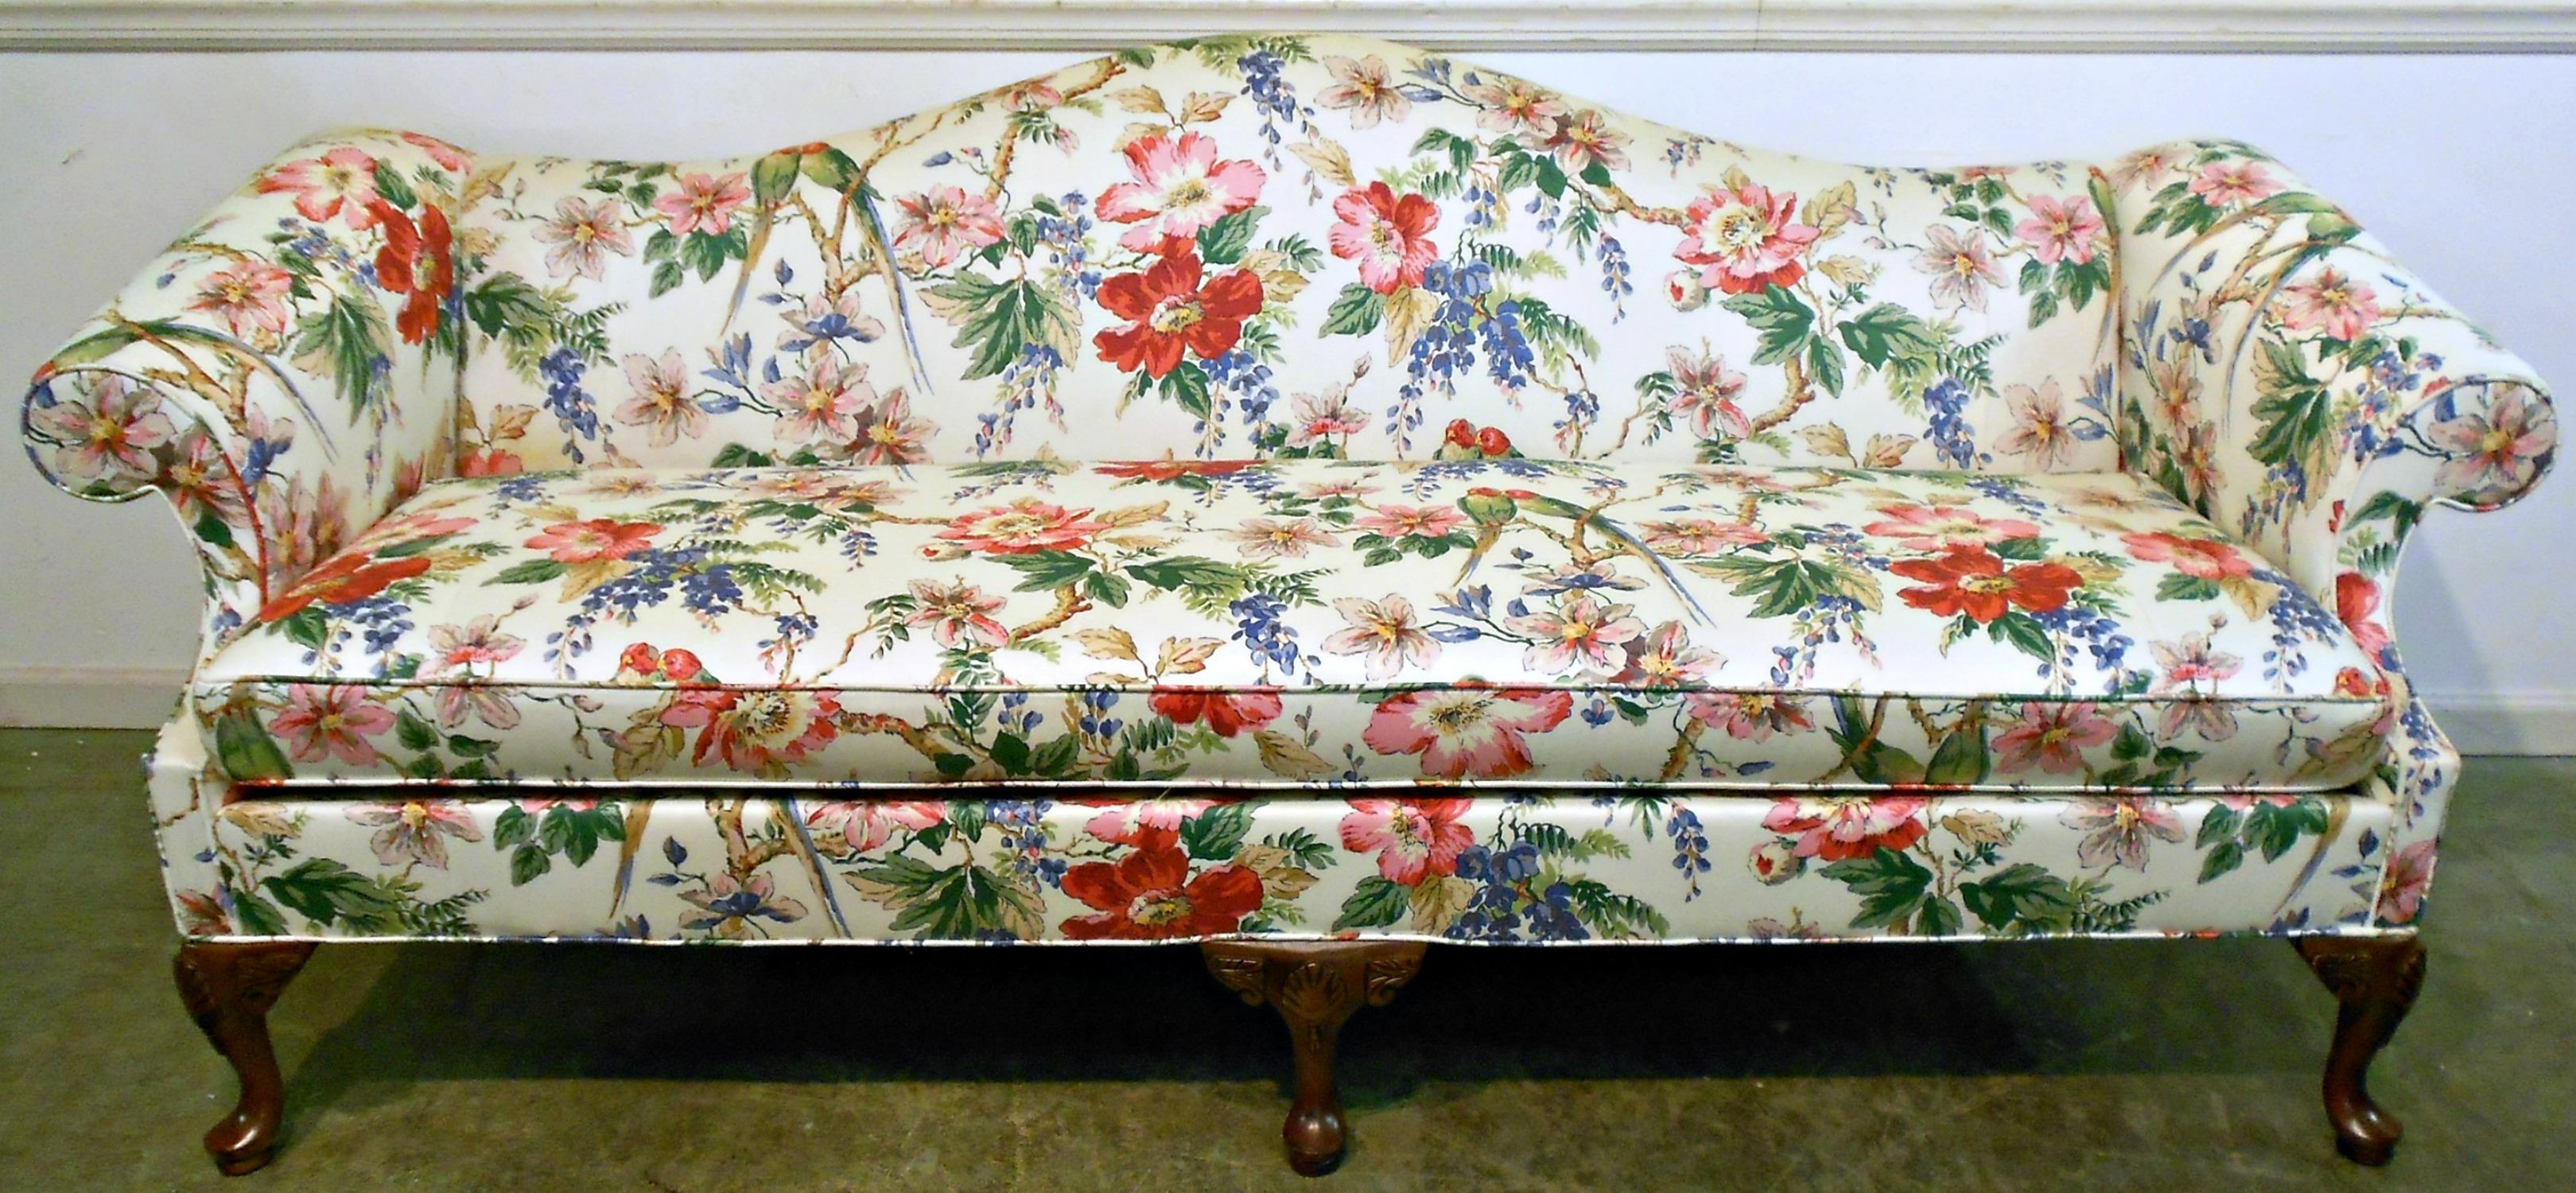 flower sofa covers corner bed chaise longue 20 photos floral sofas ideas